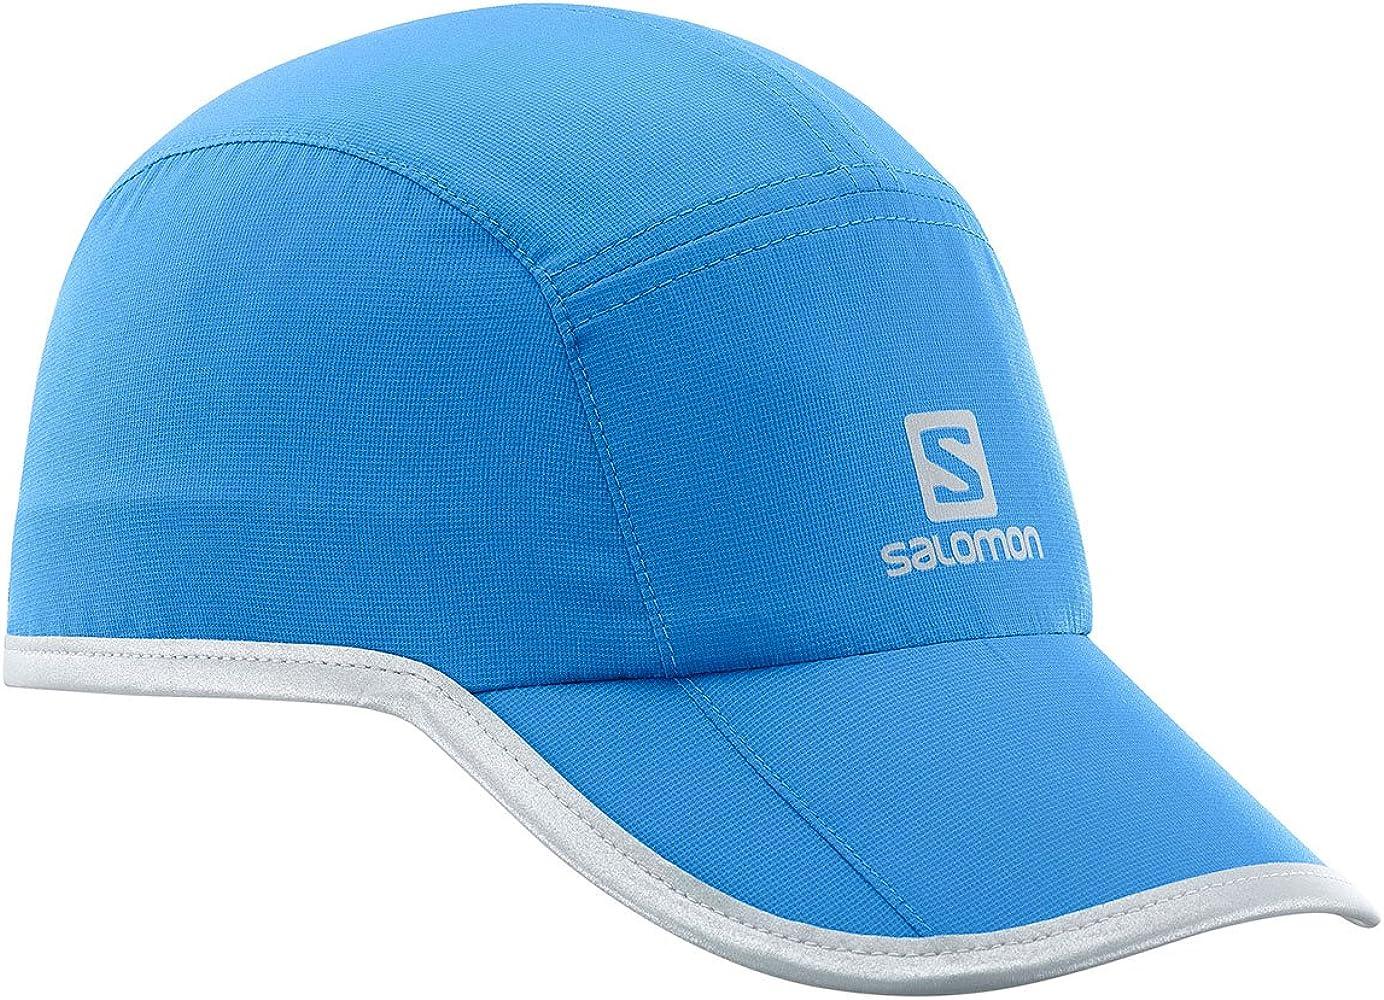 Salomon Cap XA Cap Reflective - Gorra, Unisex Adultos, Azul ...